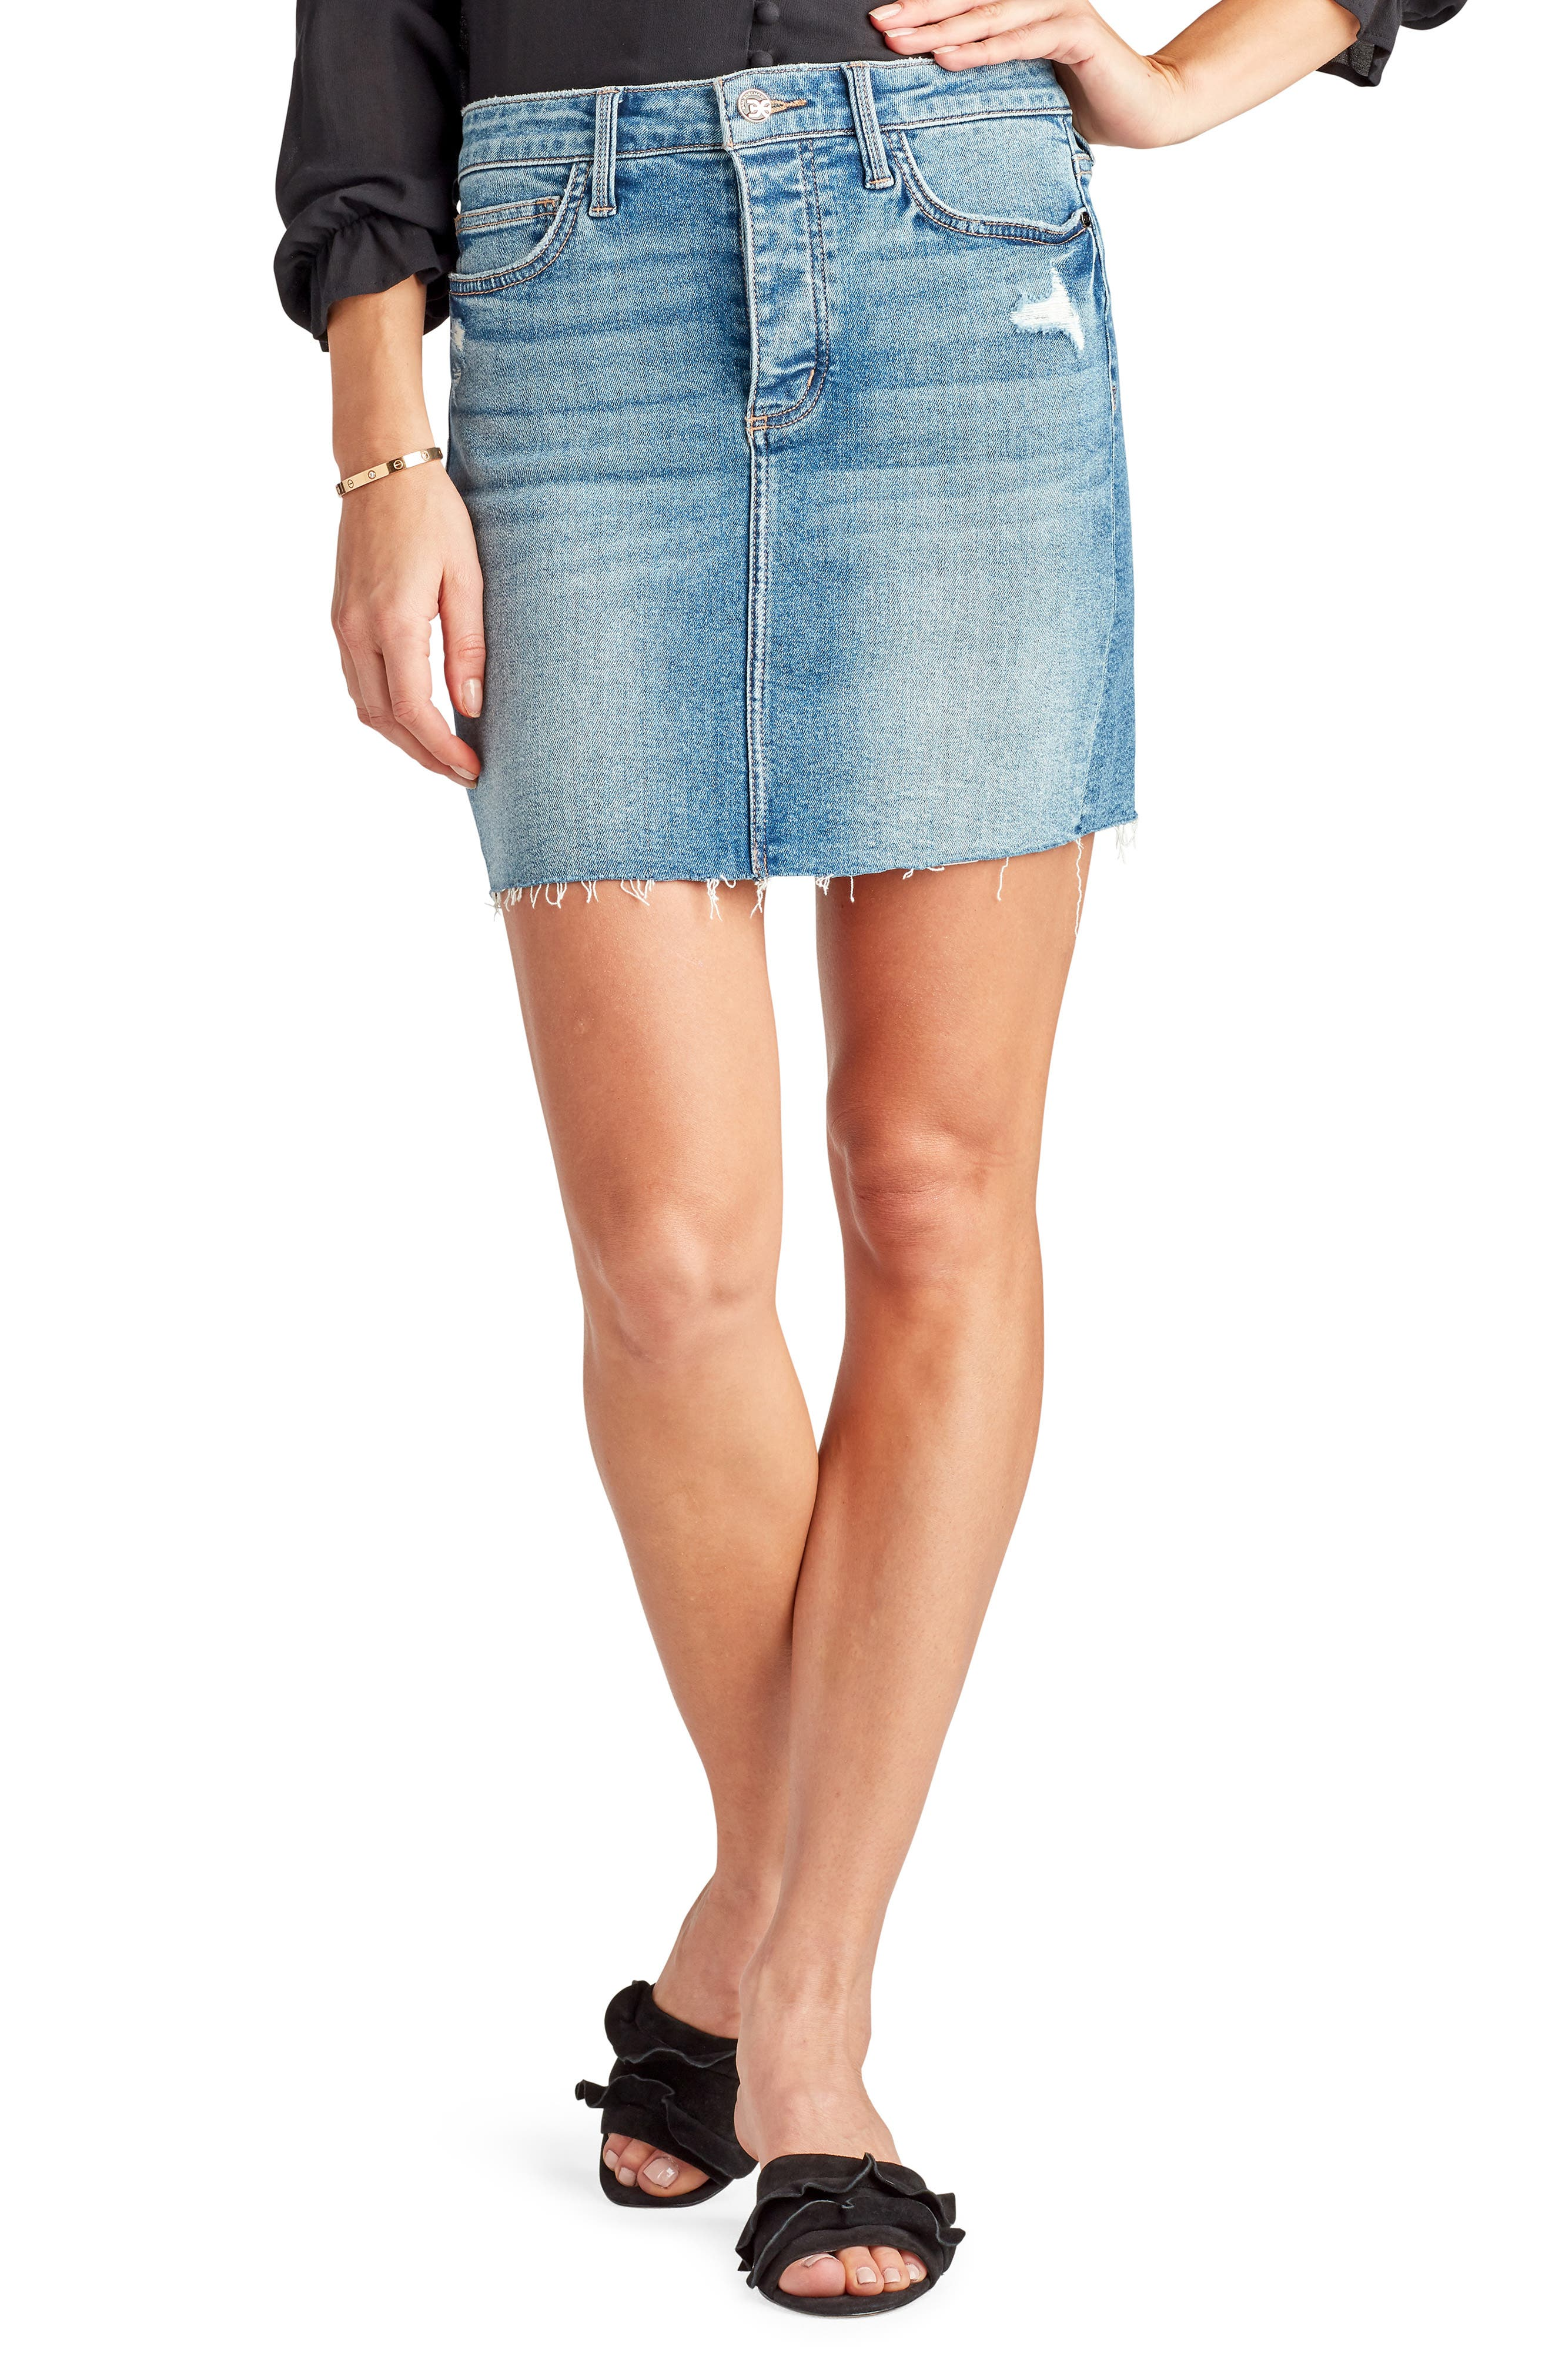 Image of Sam Edelman The Jenny Ripped Denim Skirt